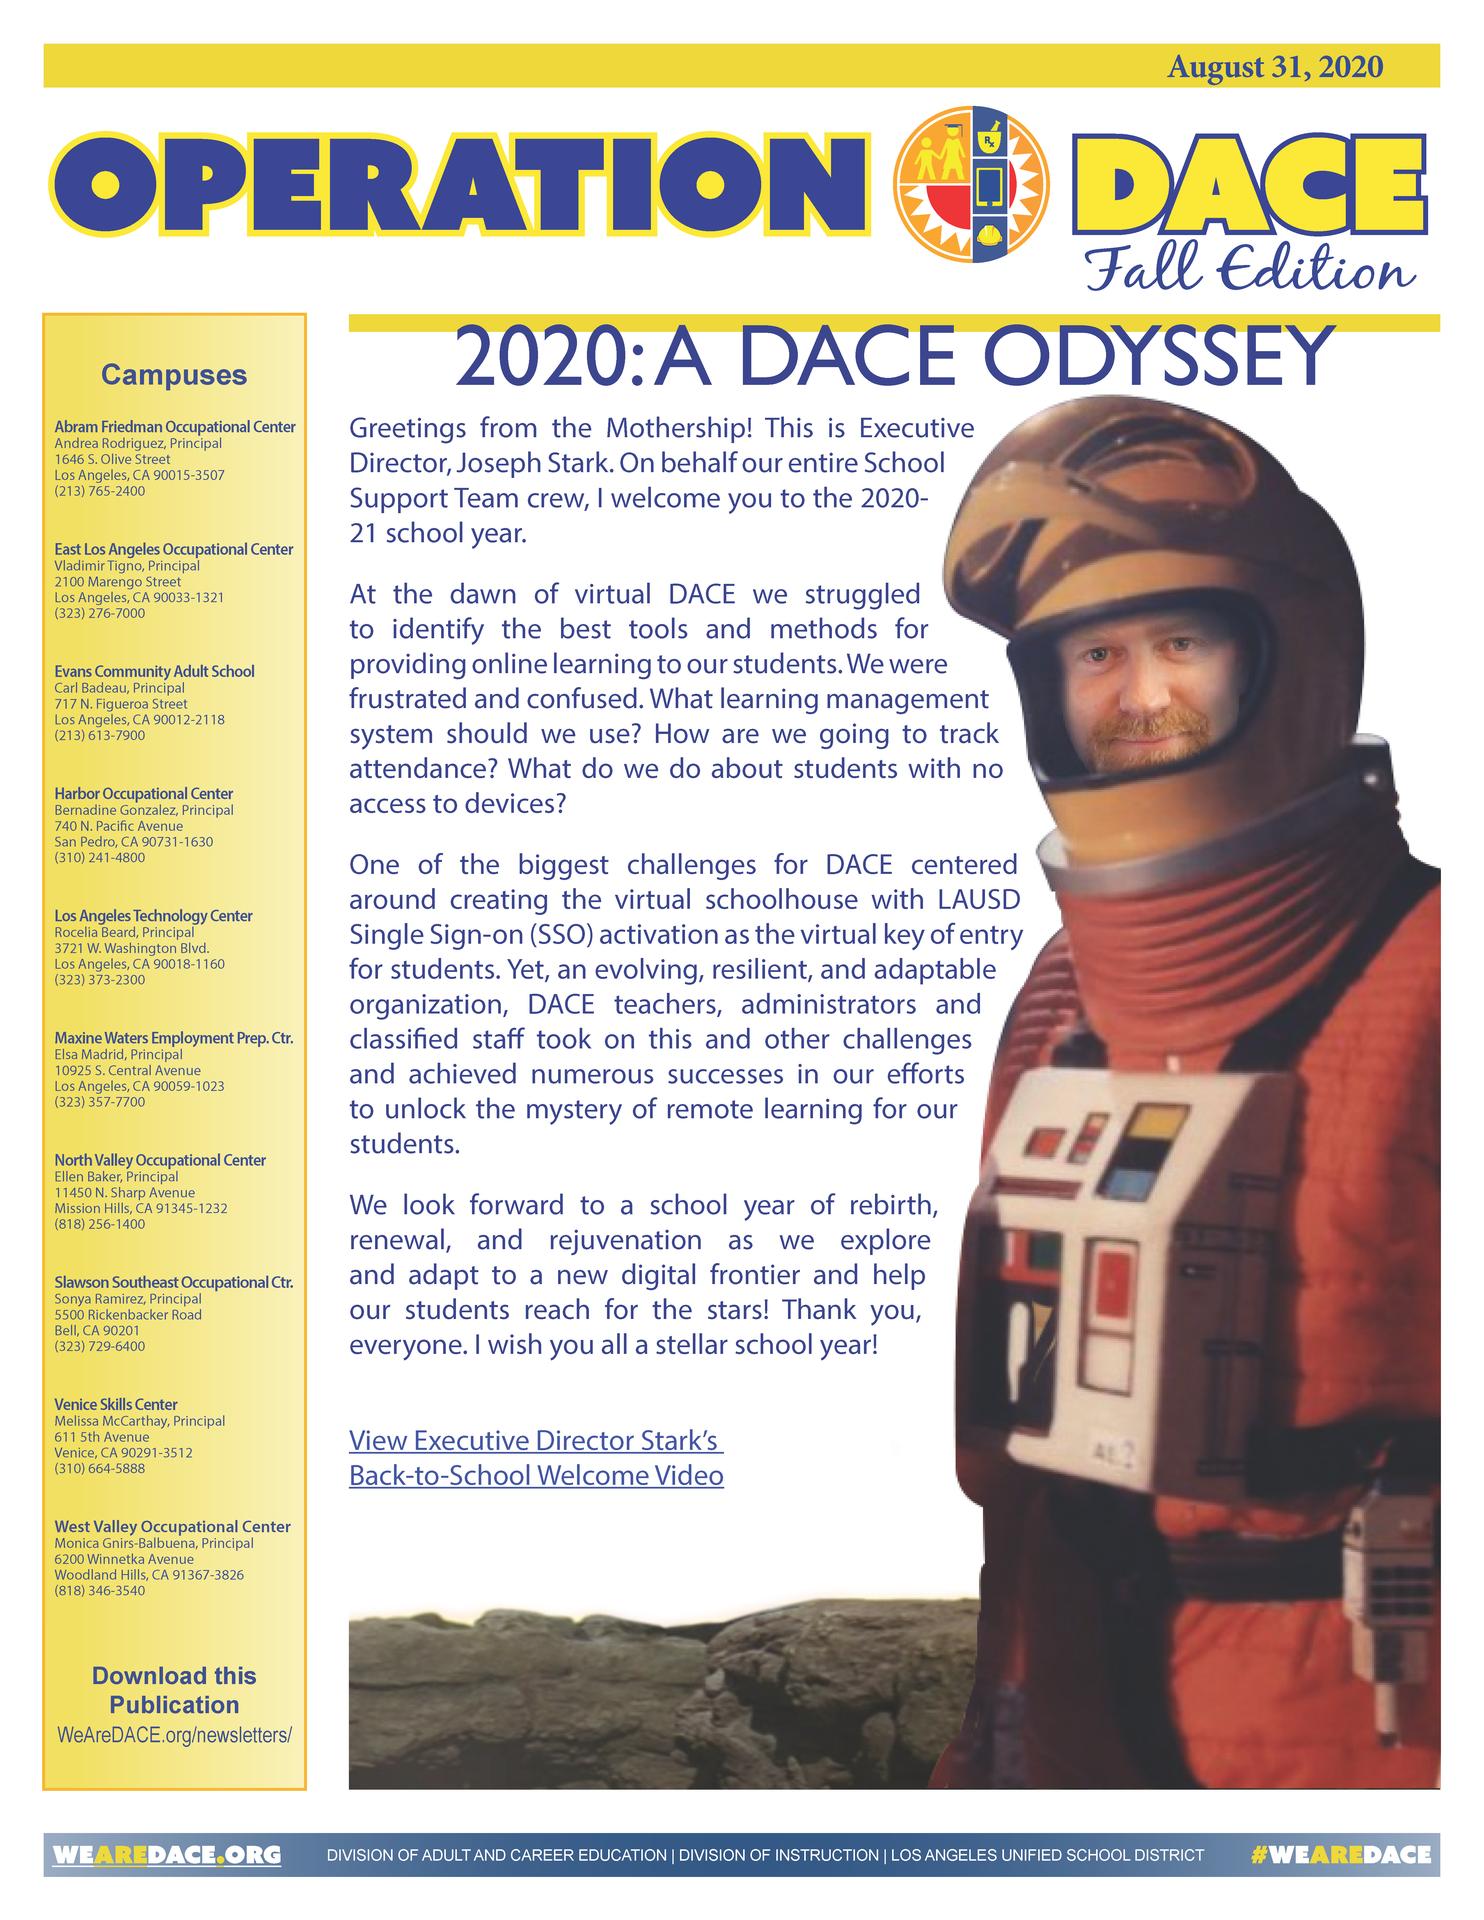 DACE Newsletter - August 31, 2020 Thumbnail